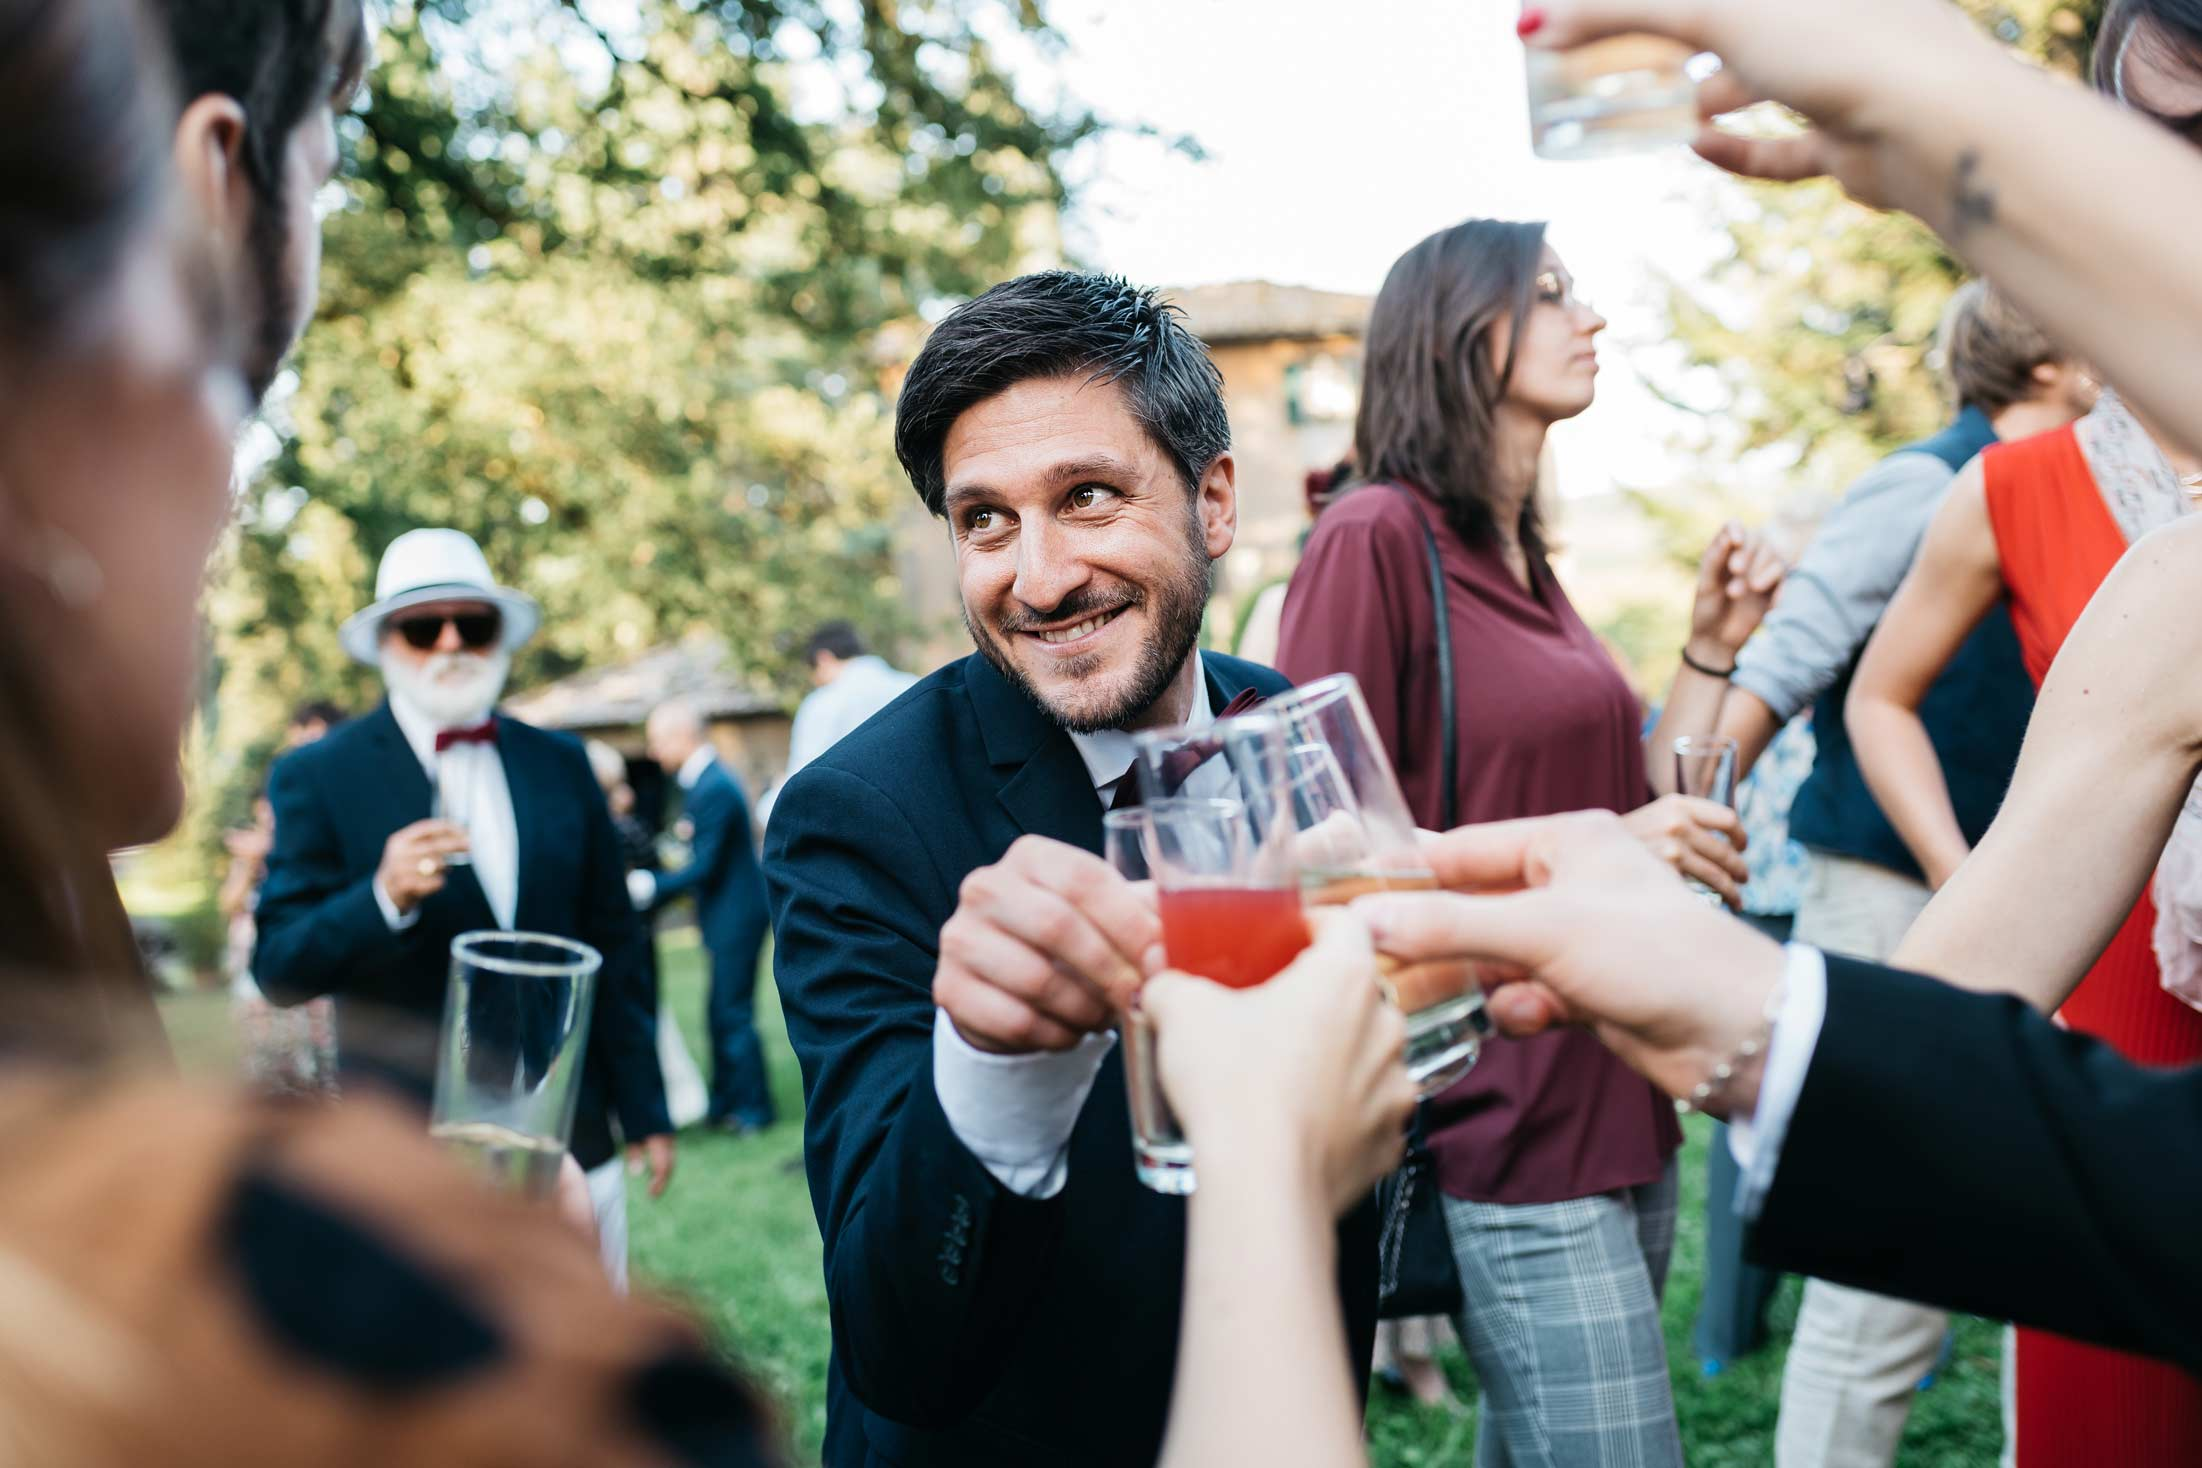 Matrimonio-Fotografo-Roma-Reportage-Ricevimento